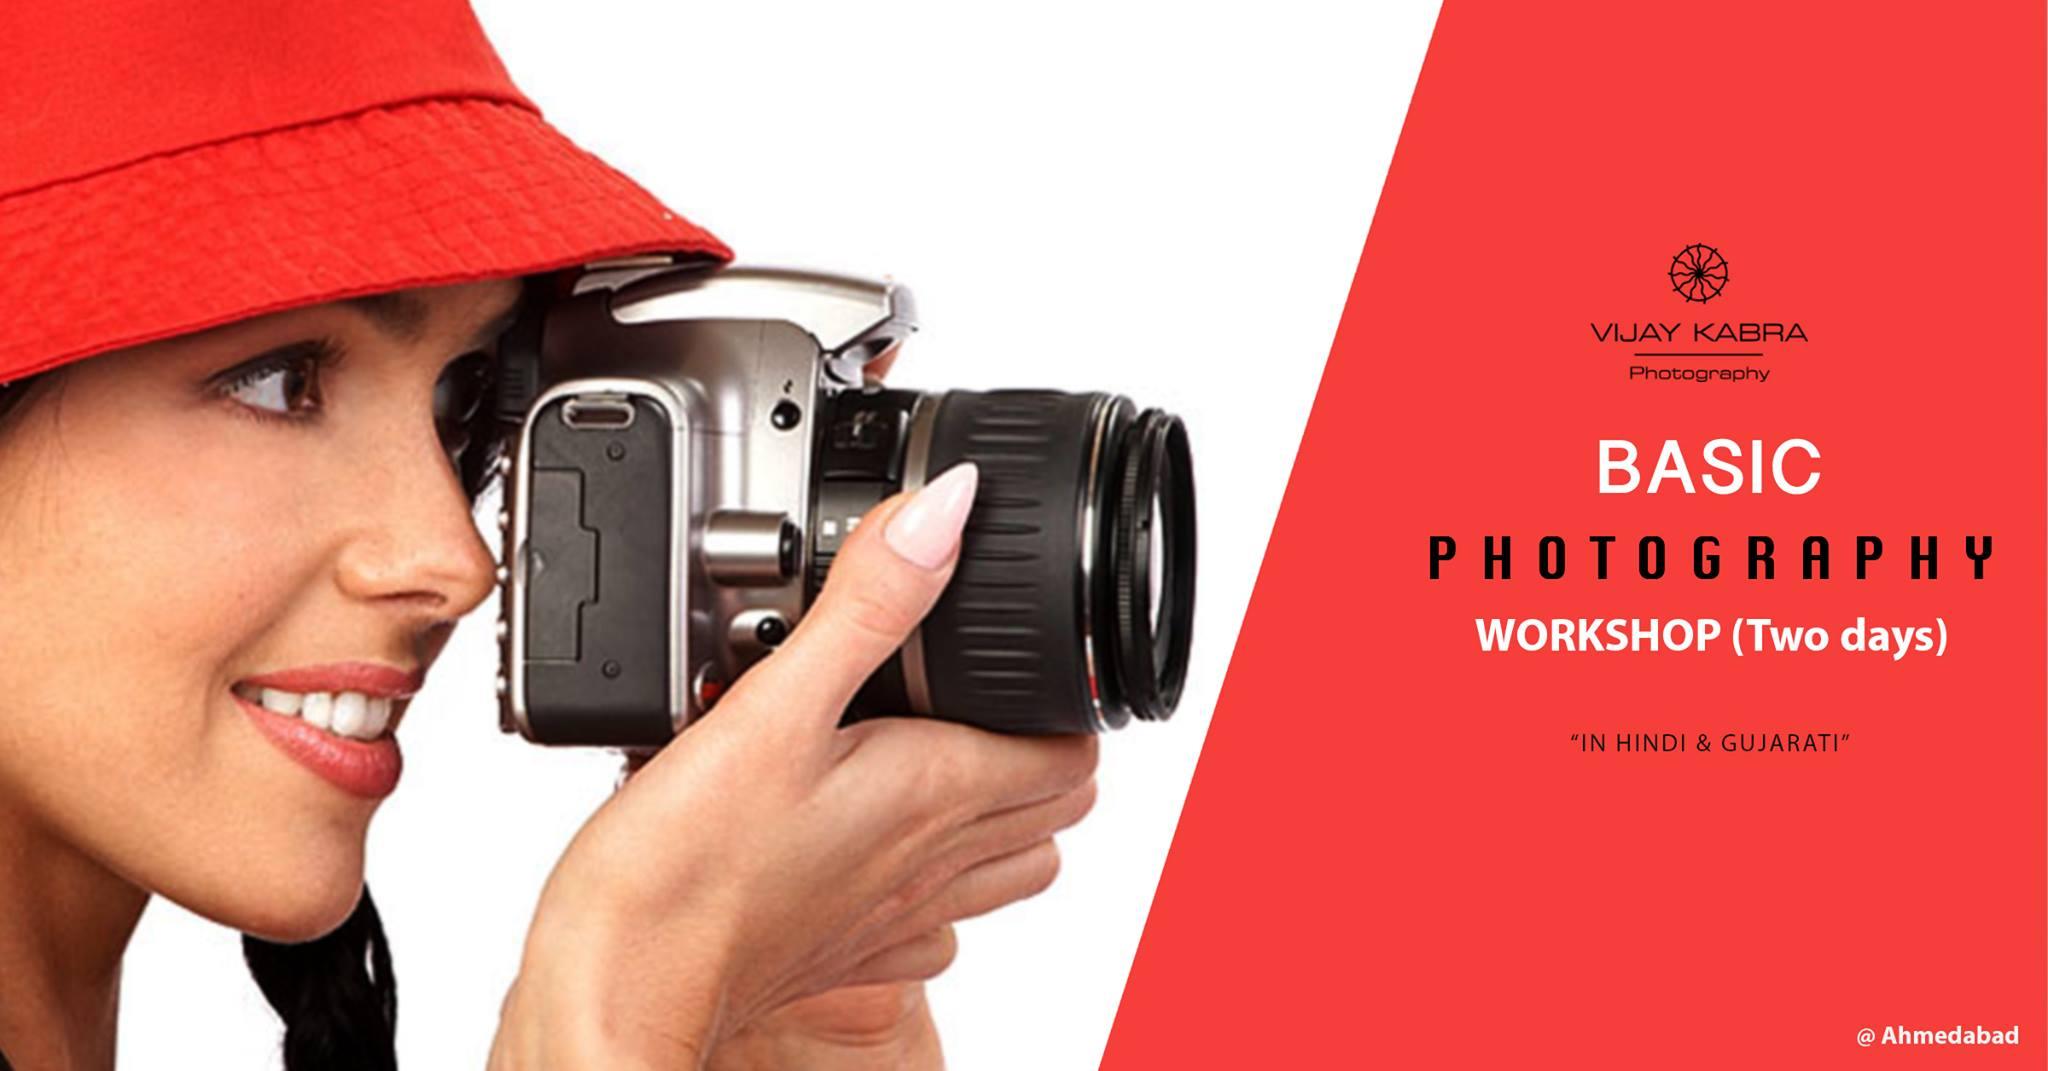 https://creativeyatra.com/wp-content/uploads/2019/05/Basic-Photography-Workshop-At-Ahmedabad.jpg